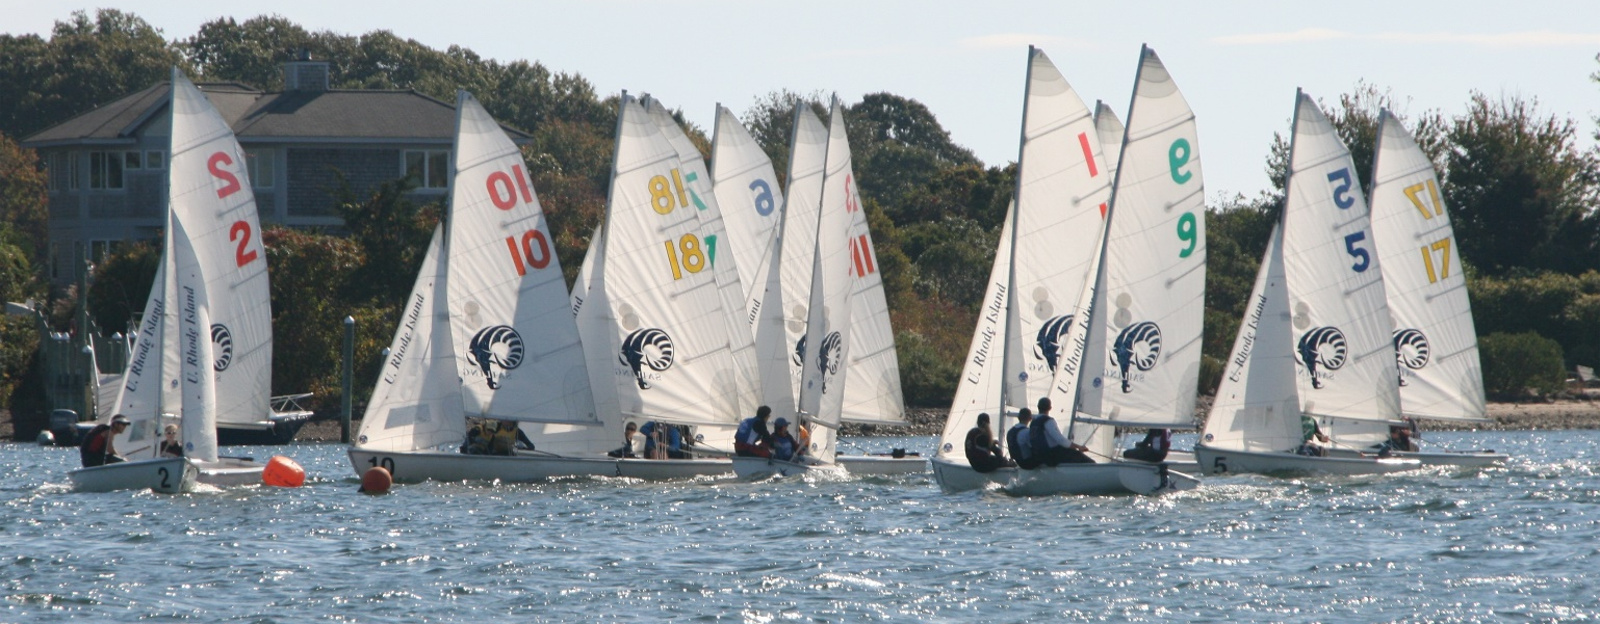 Fleet in the waters